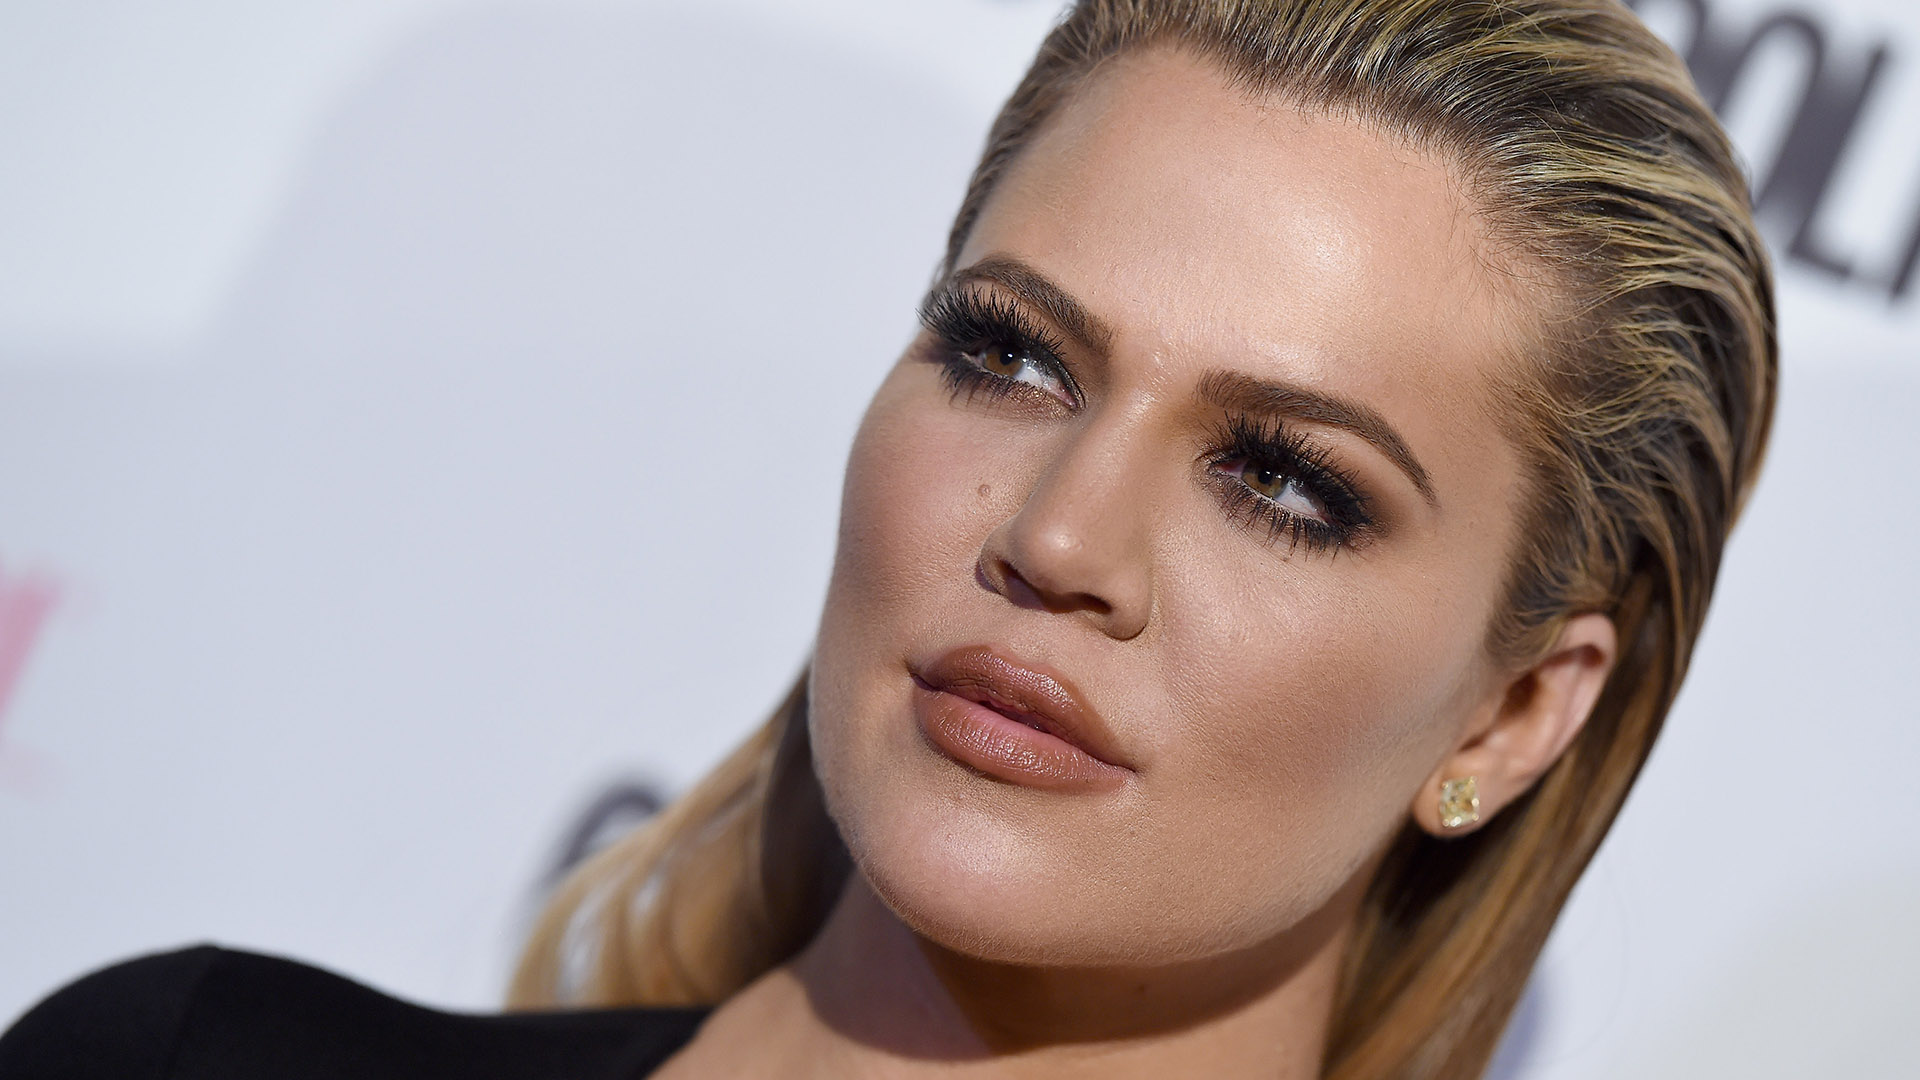 """kuwk-khloe-kardashian-shows-off-her-massive-lips-in-new-pic"""